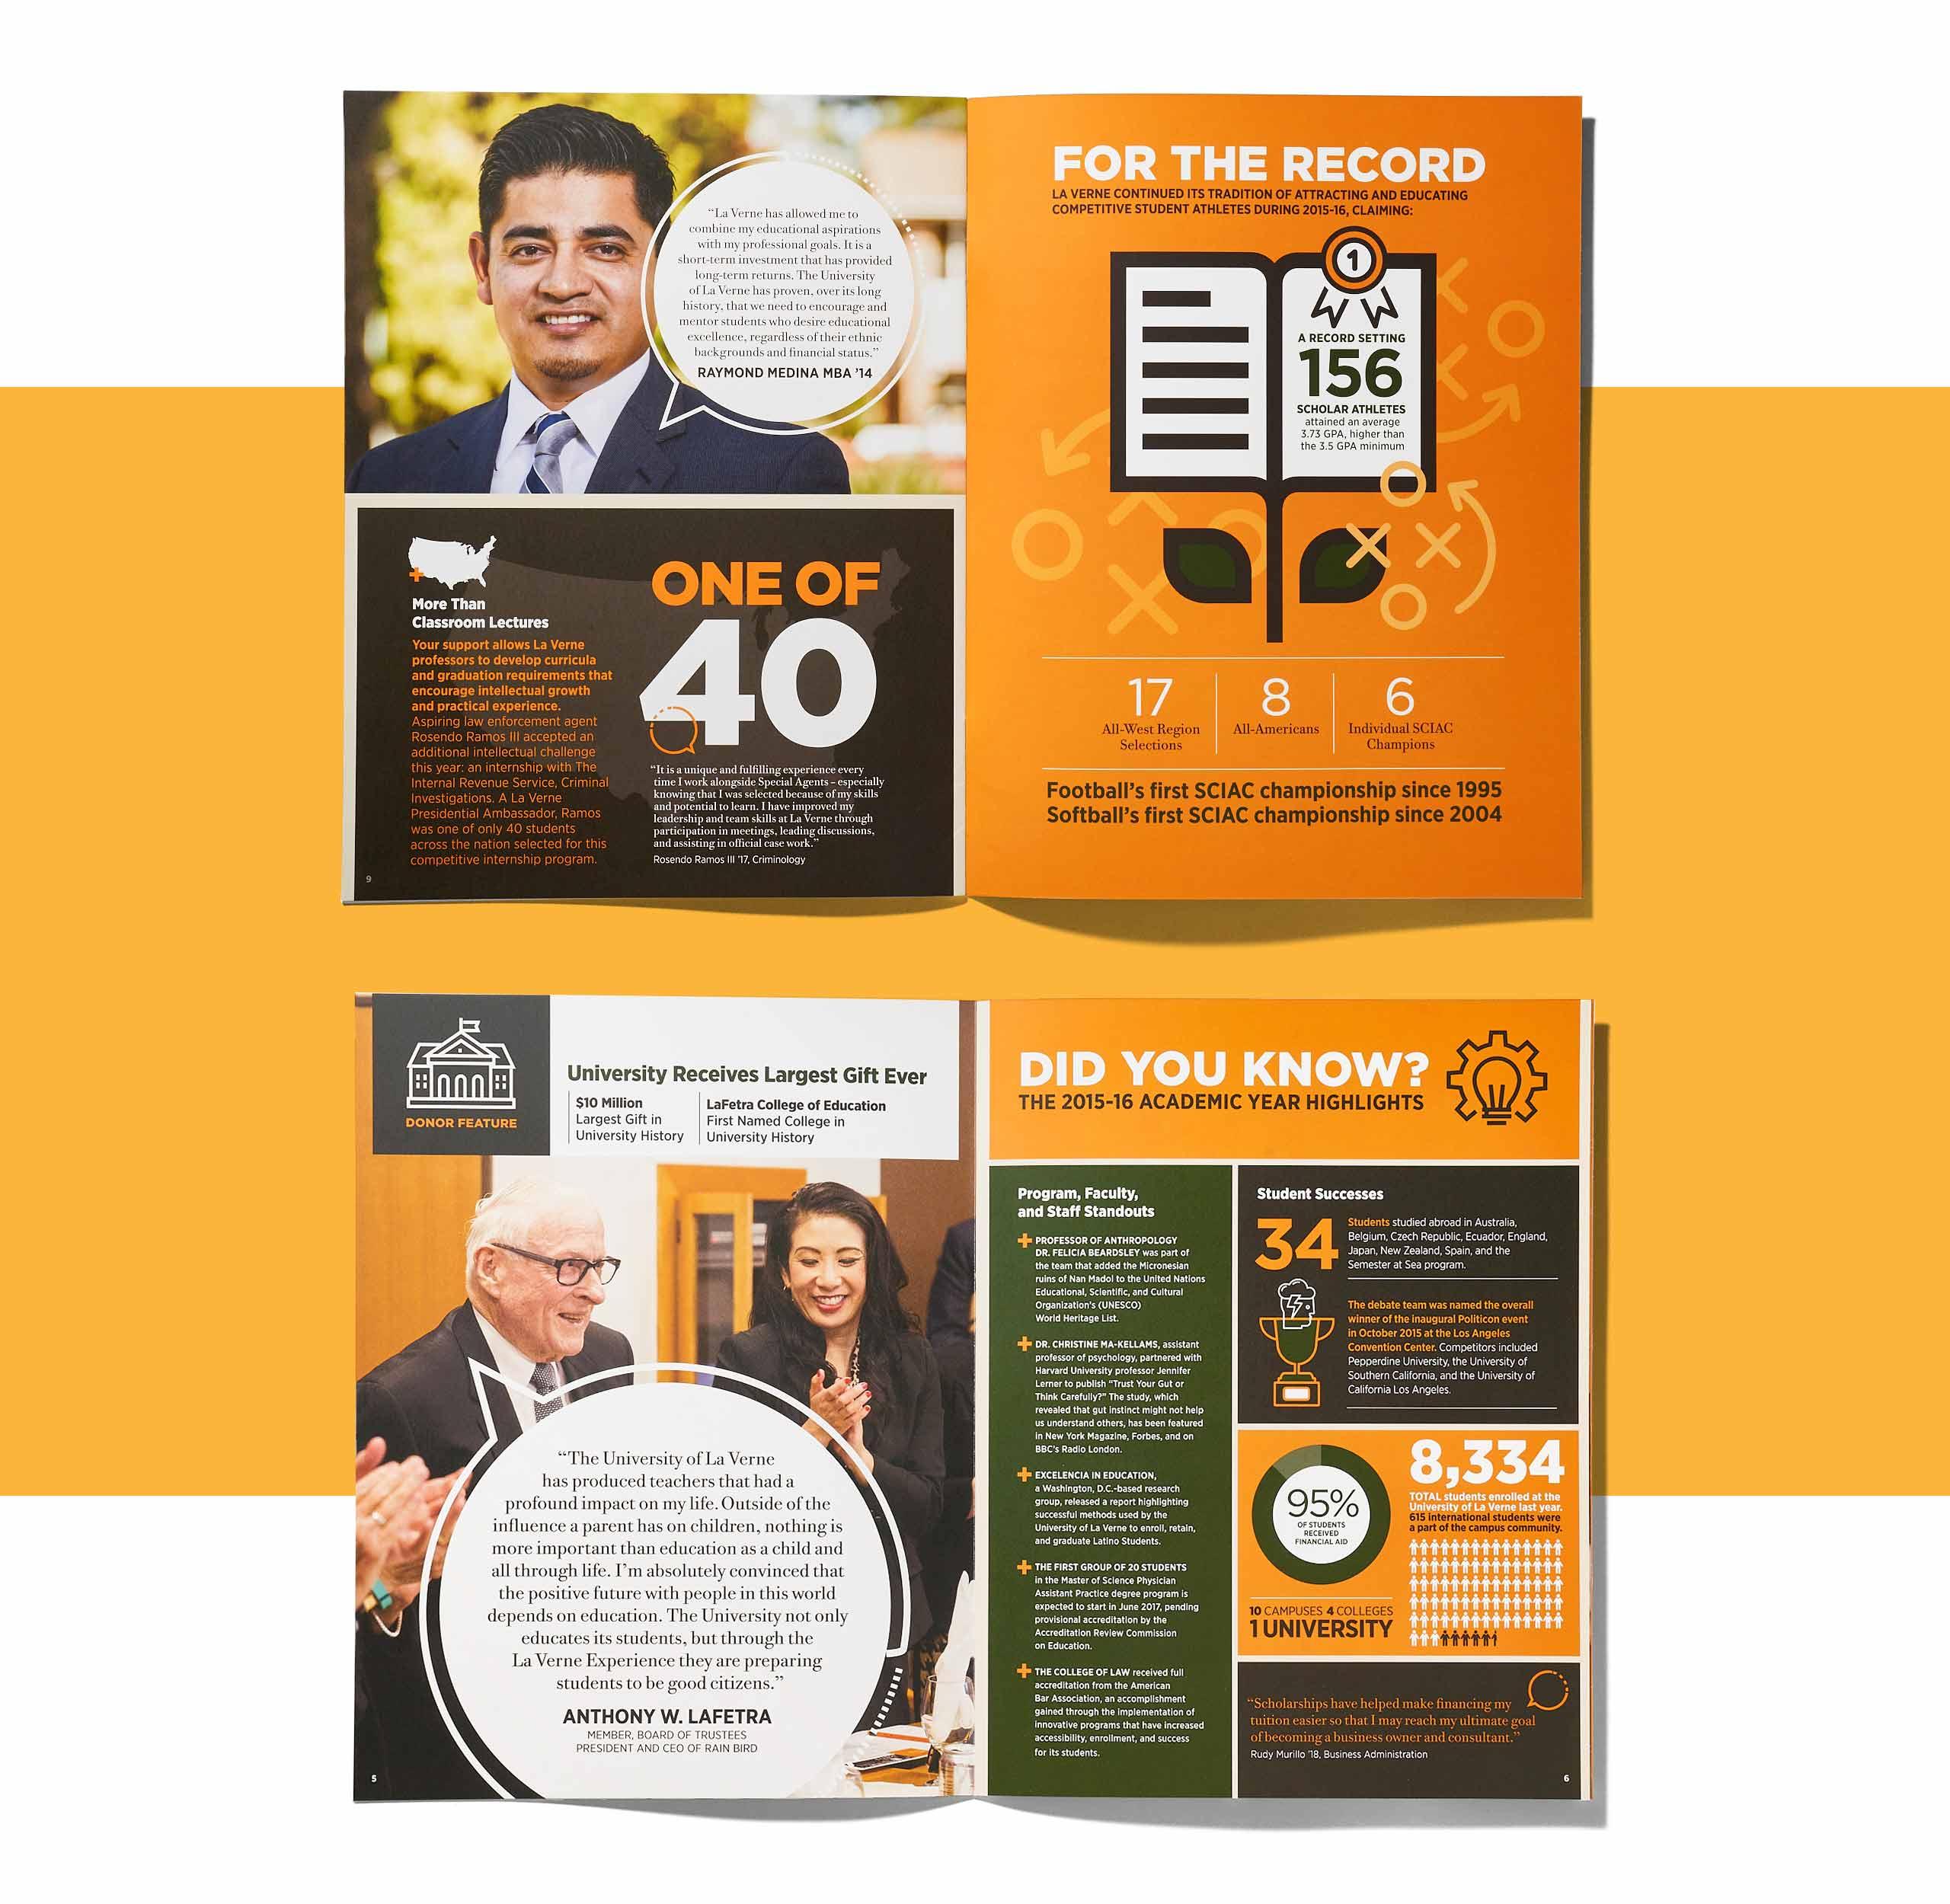 University of La Verne Infographic Spreads